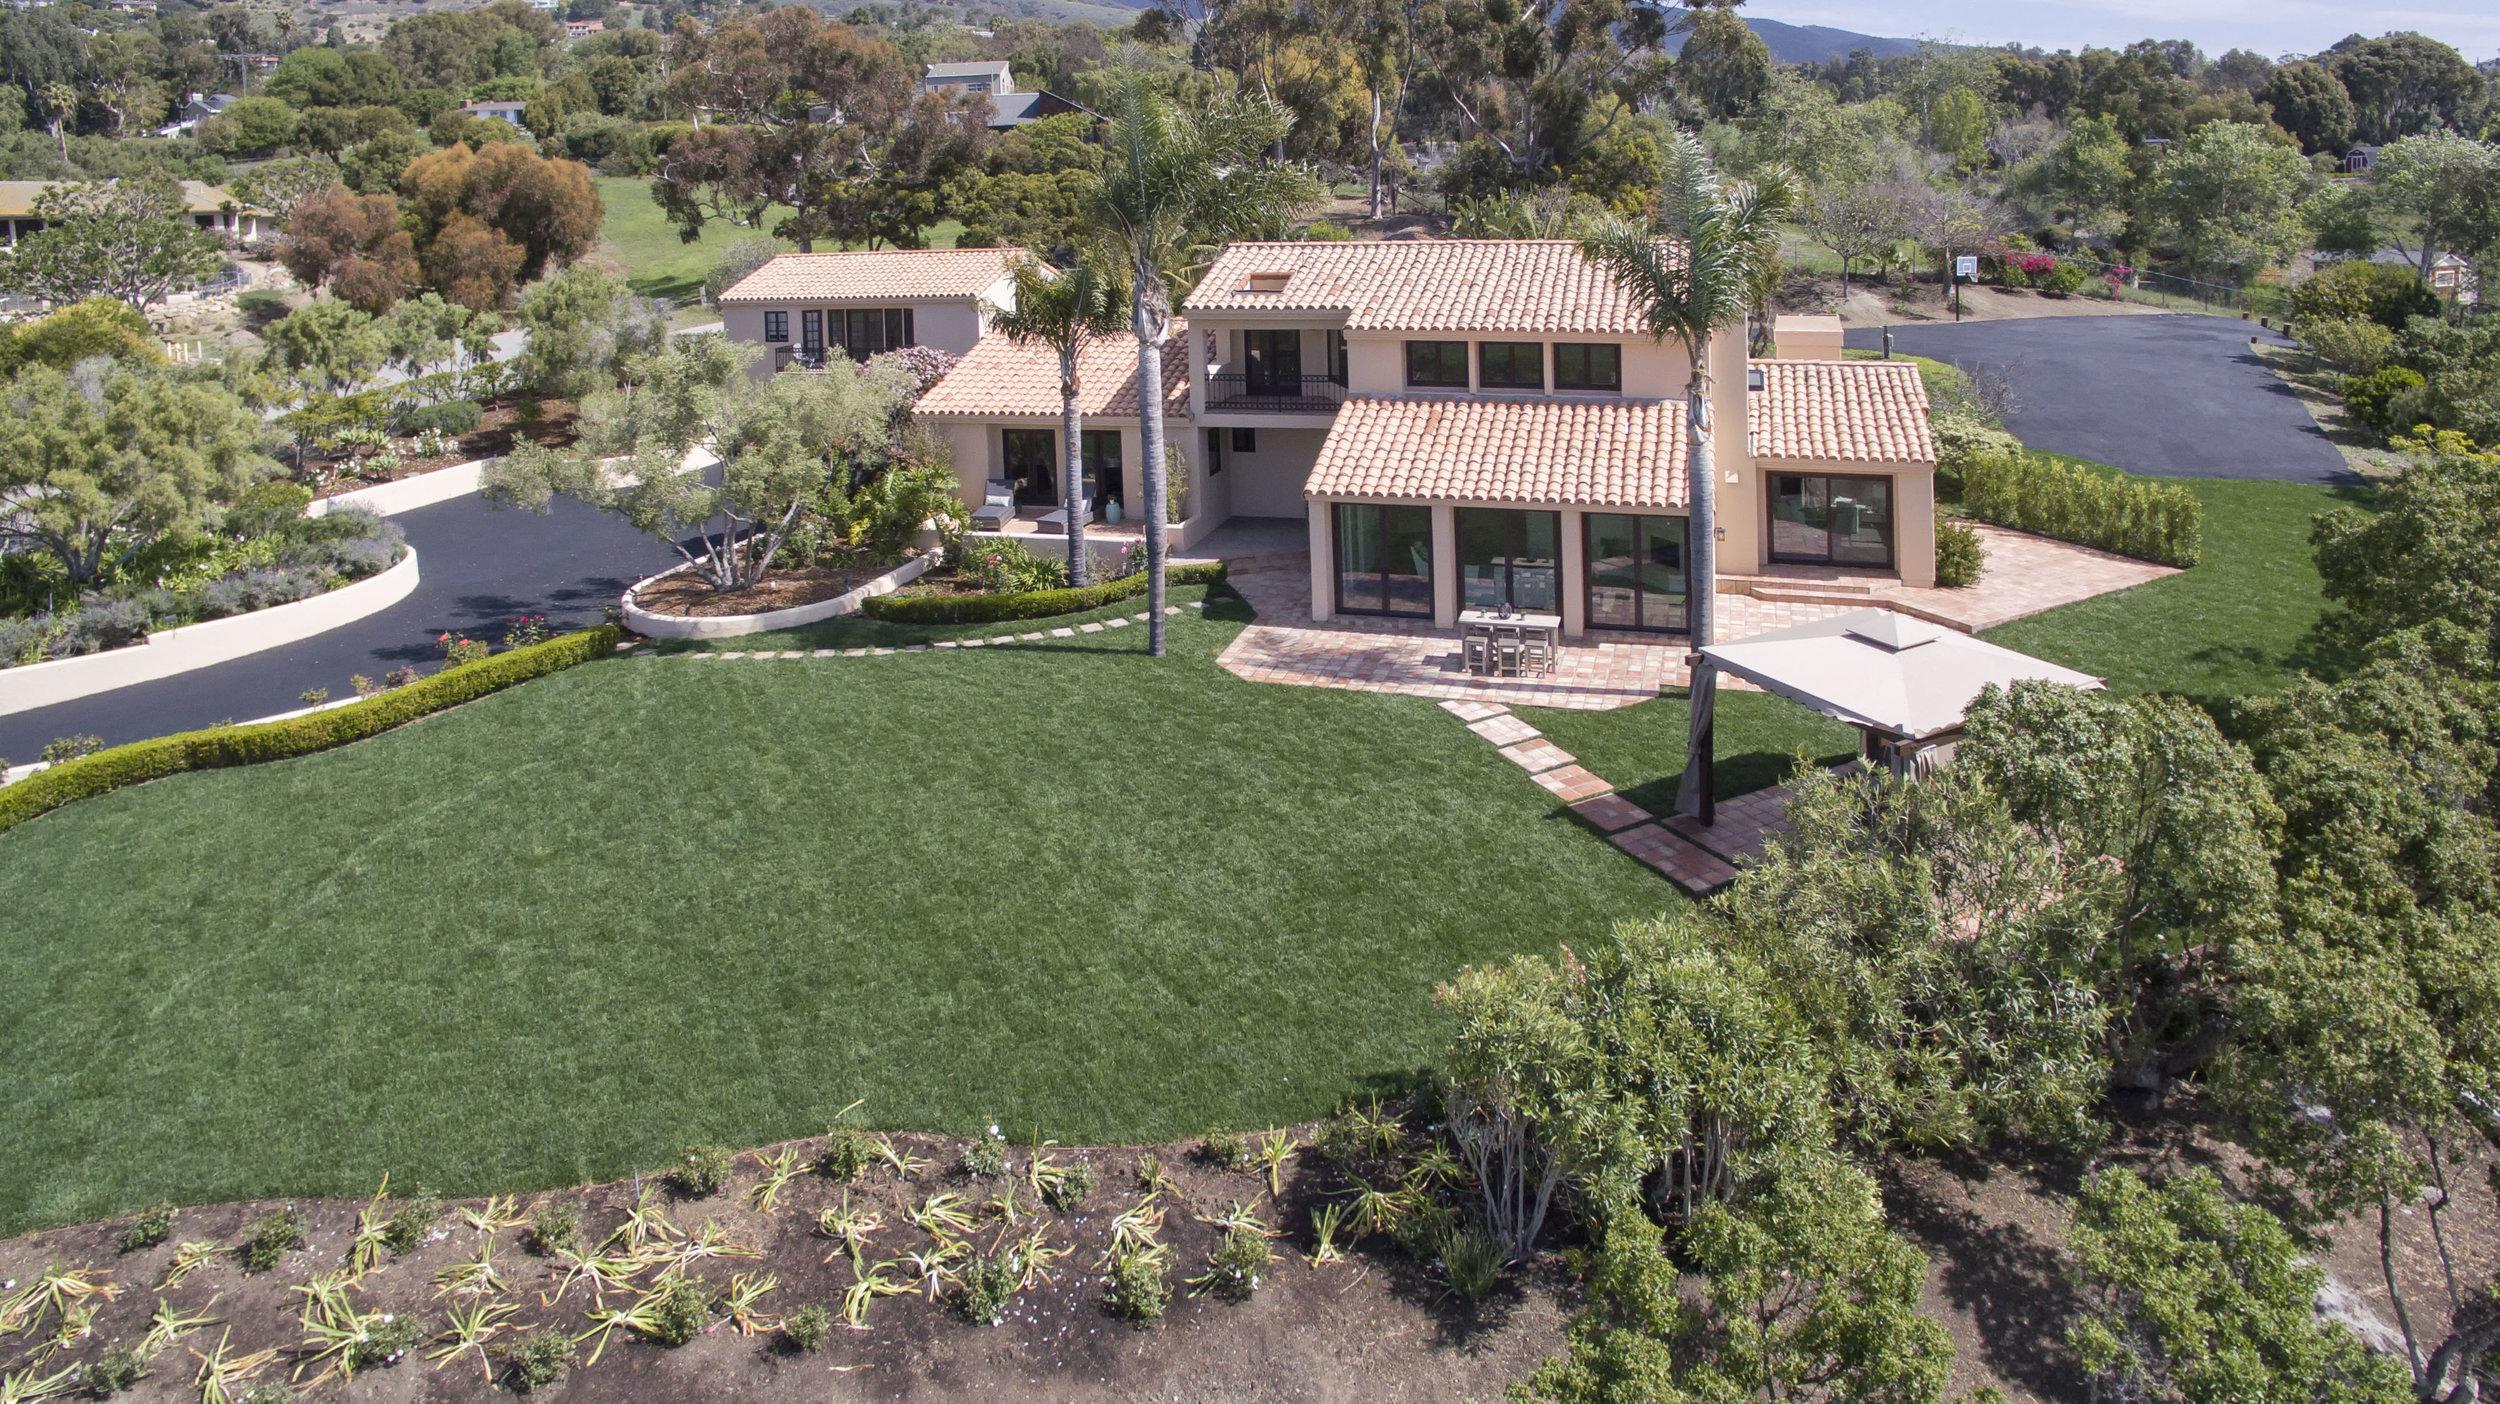 023 Aerial 6130 Via Cabrillo For Sale Lease The Malibu Life Team Luxury Real Estate.jpg